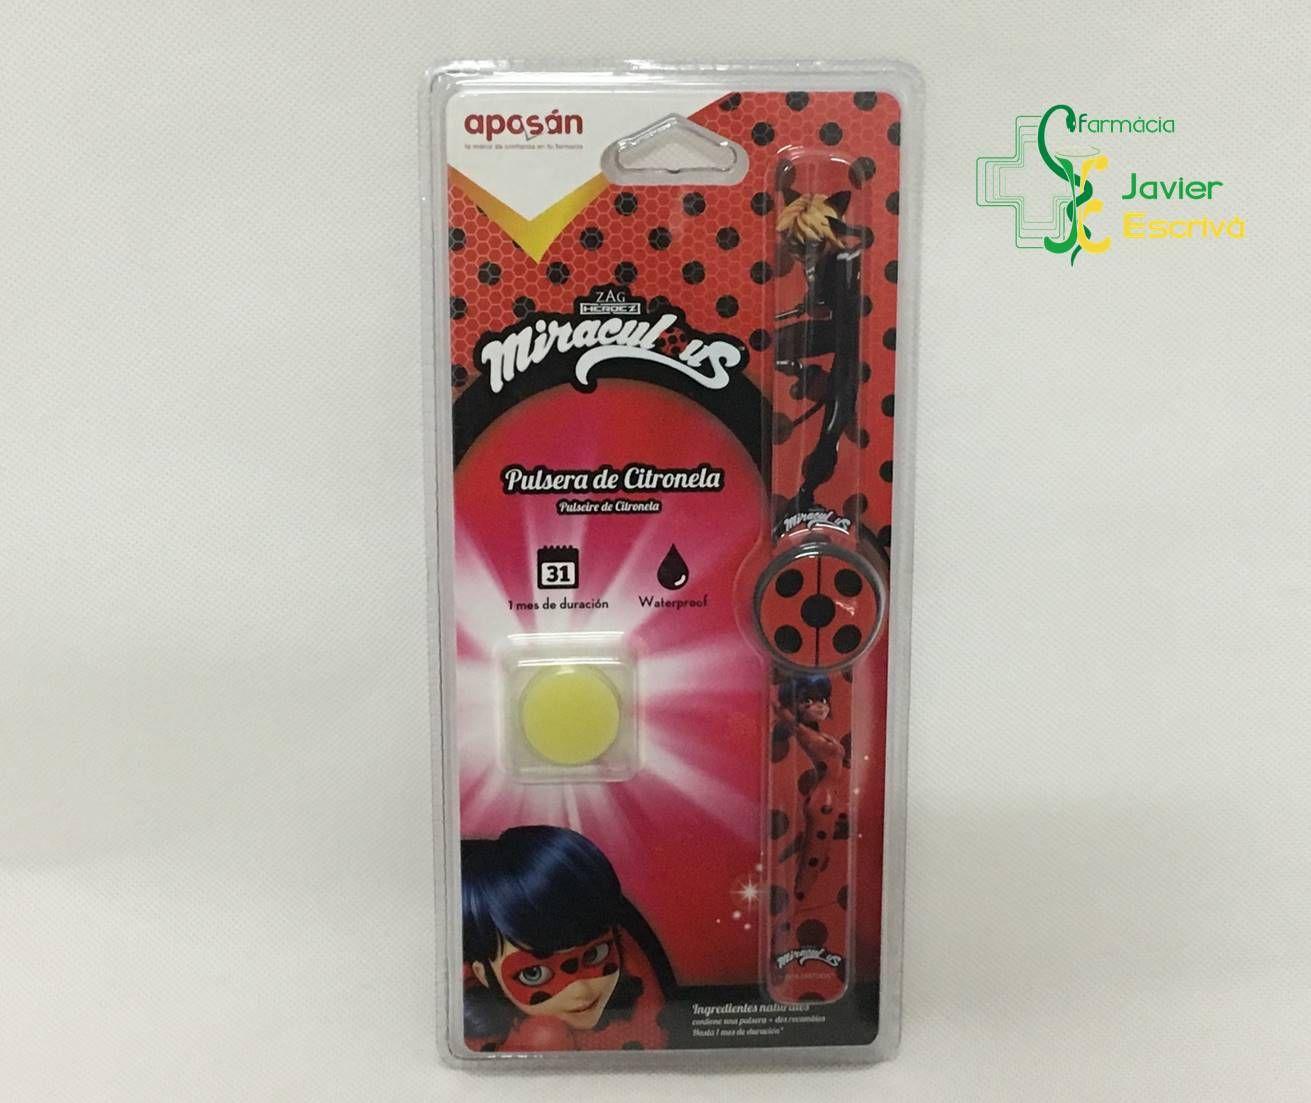 pulseras para mosquitos farmacia